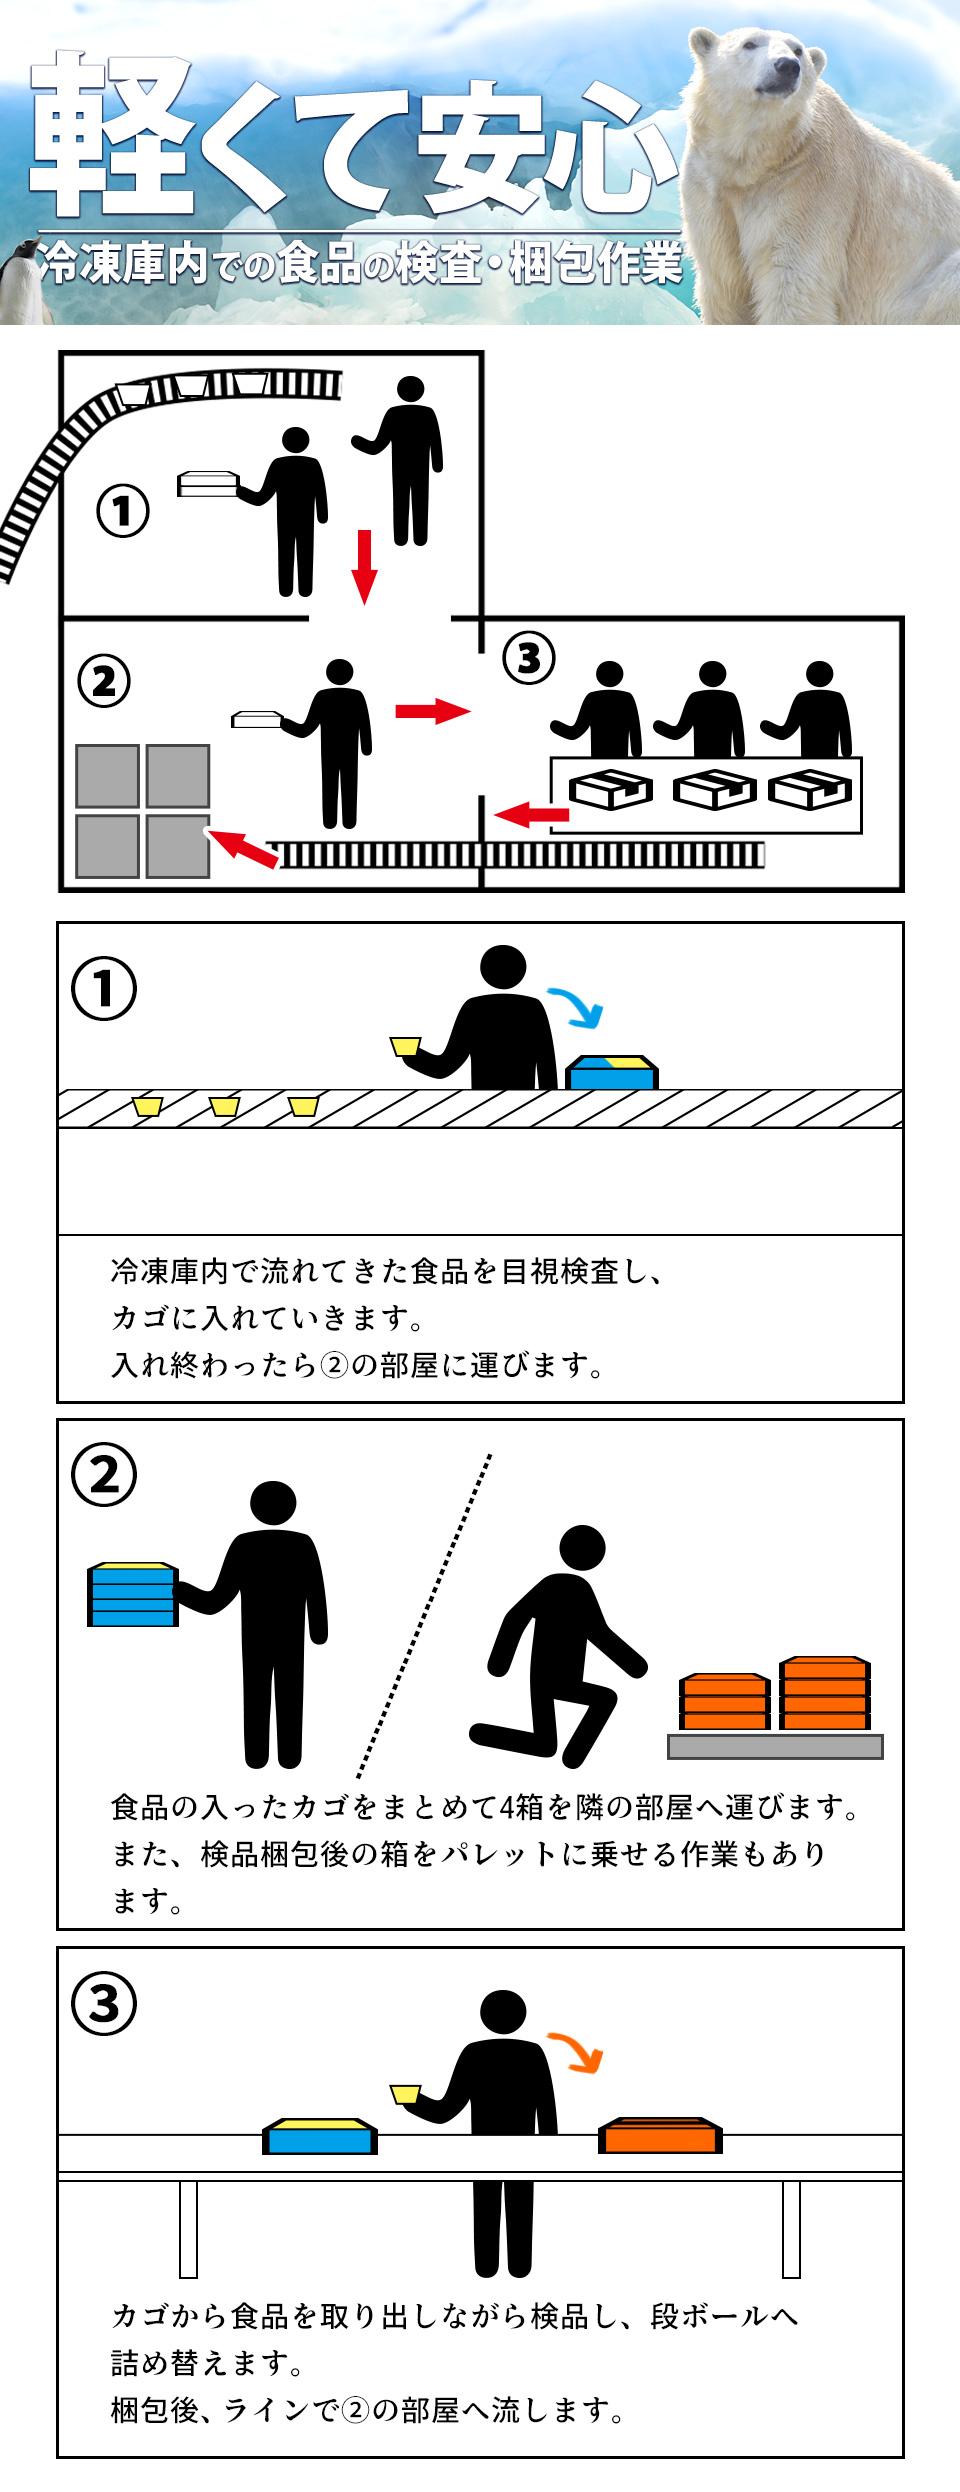 食品の検査・梱包 愛知県豊橋市の派遣社員求人